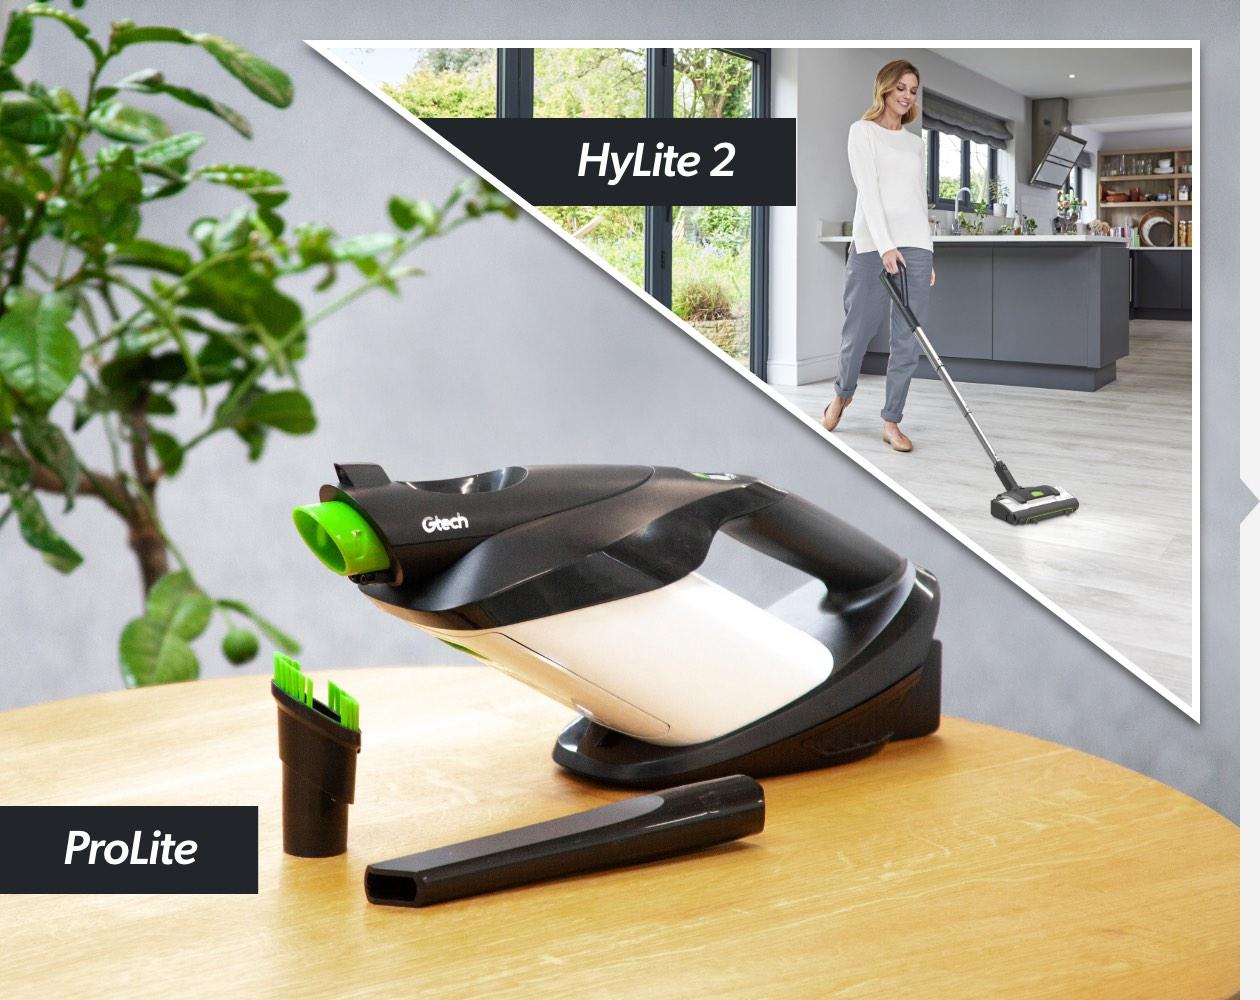 HyLite 2 and ProLite lightweight, bagged vacuum bundle